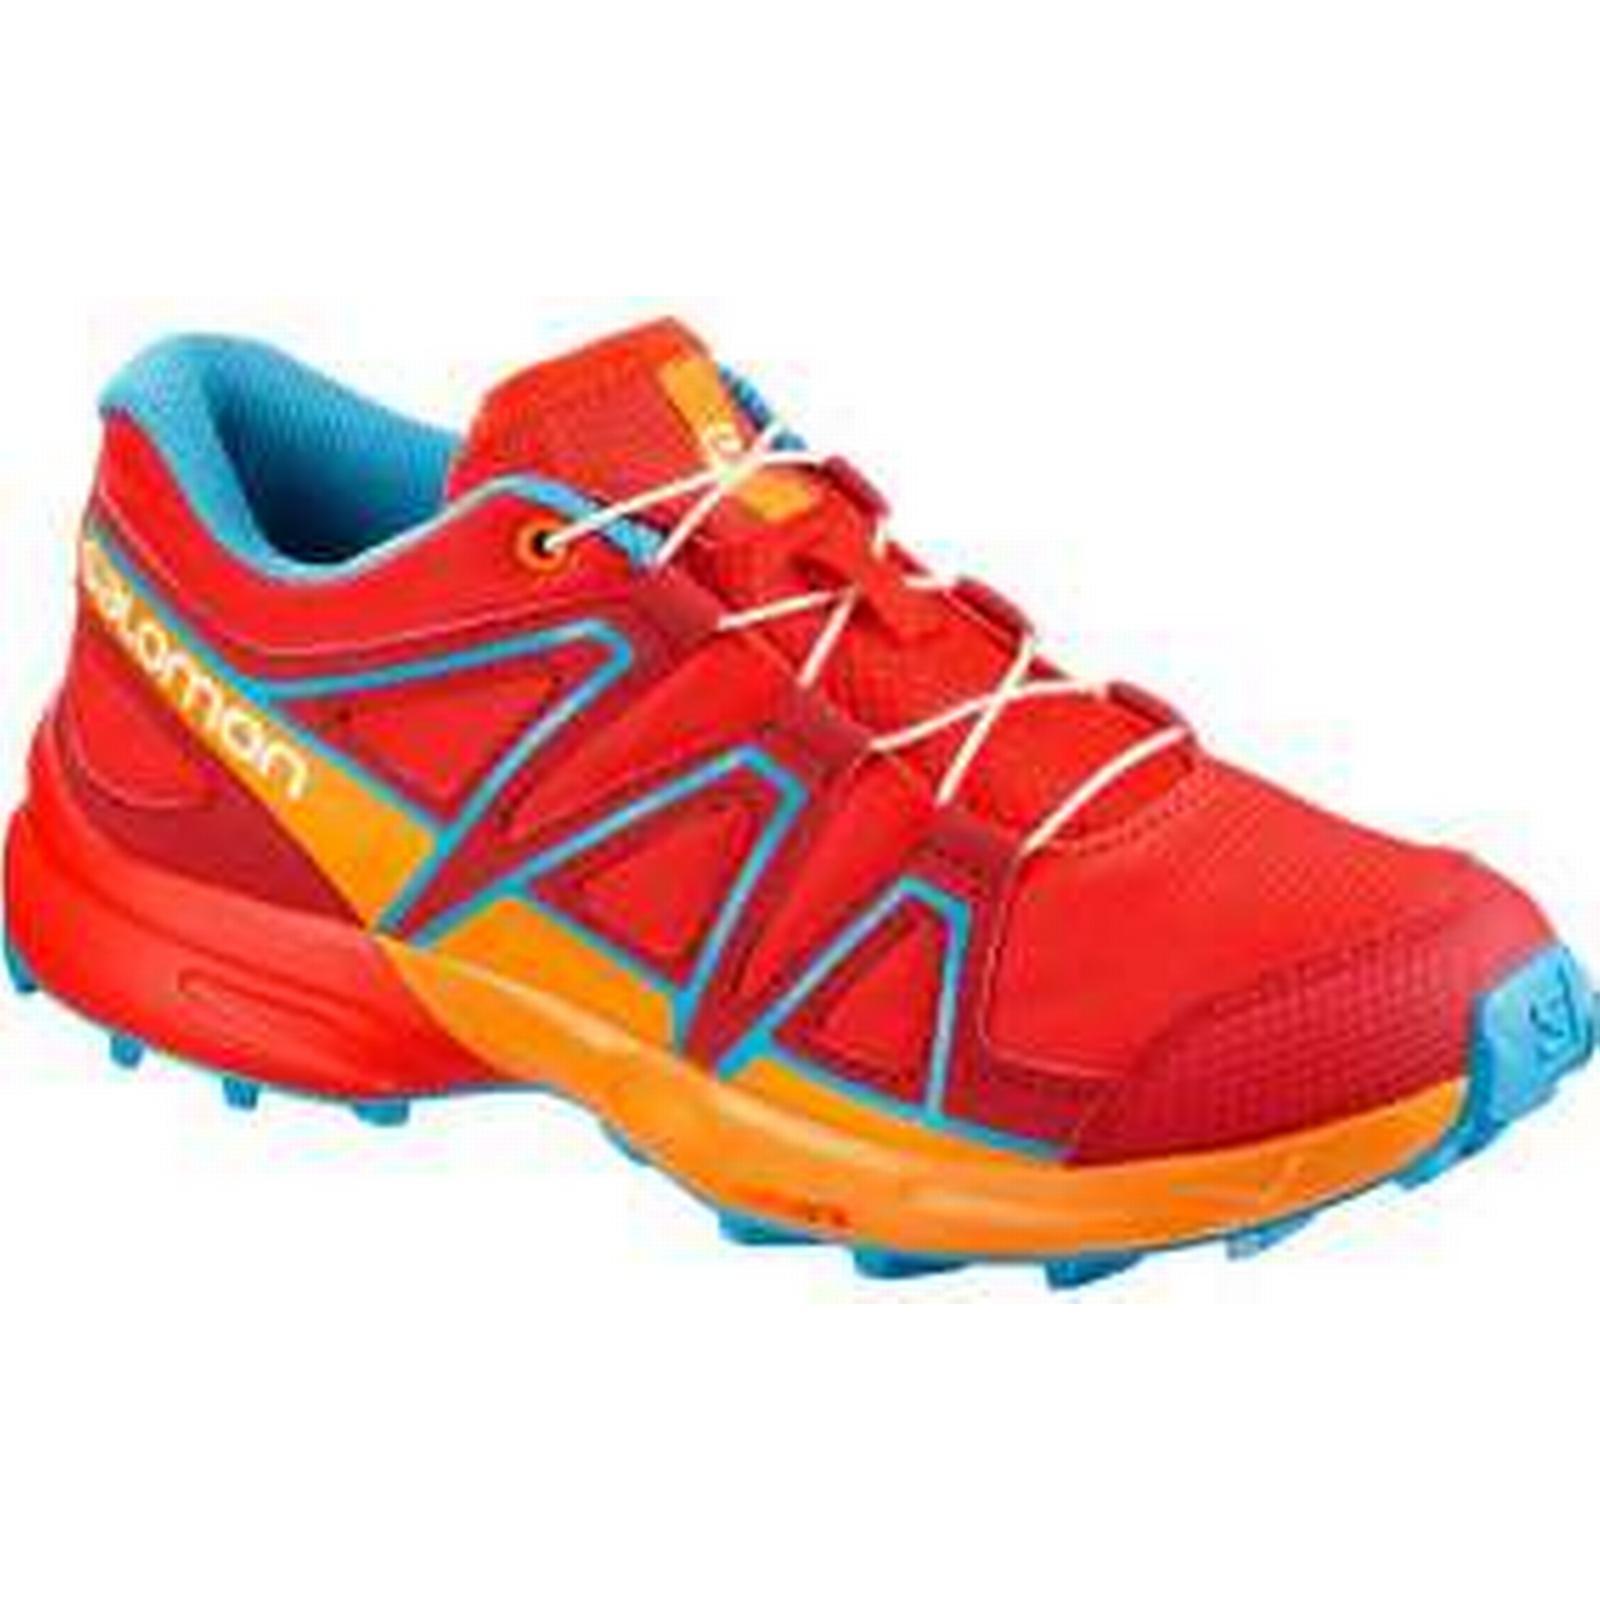 Man's/Woman's:Childrens Speedcross Shoe: Shoe: Speedcross King of quantity 7c5f9c